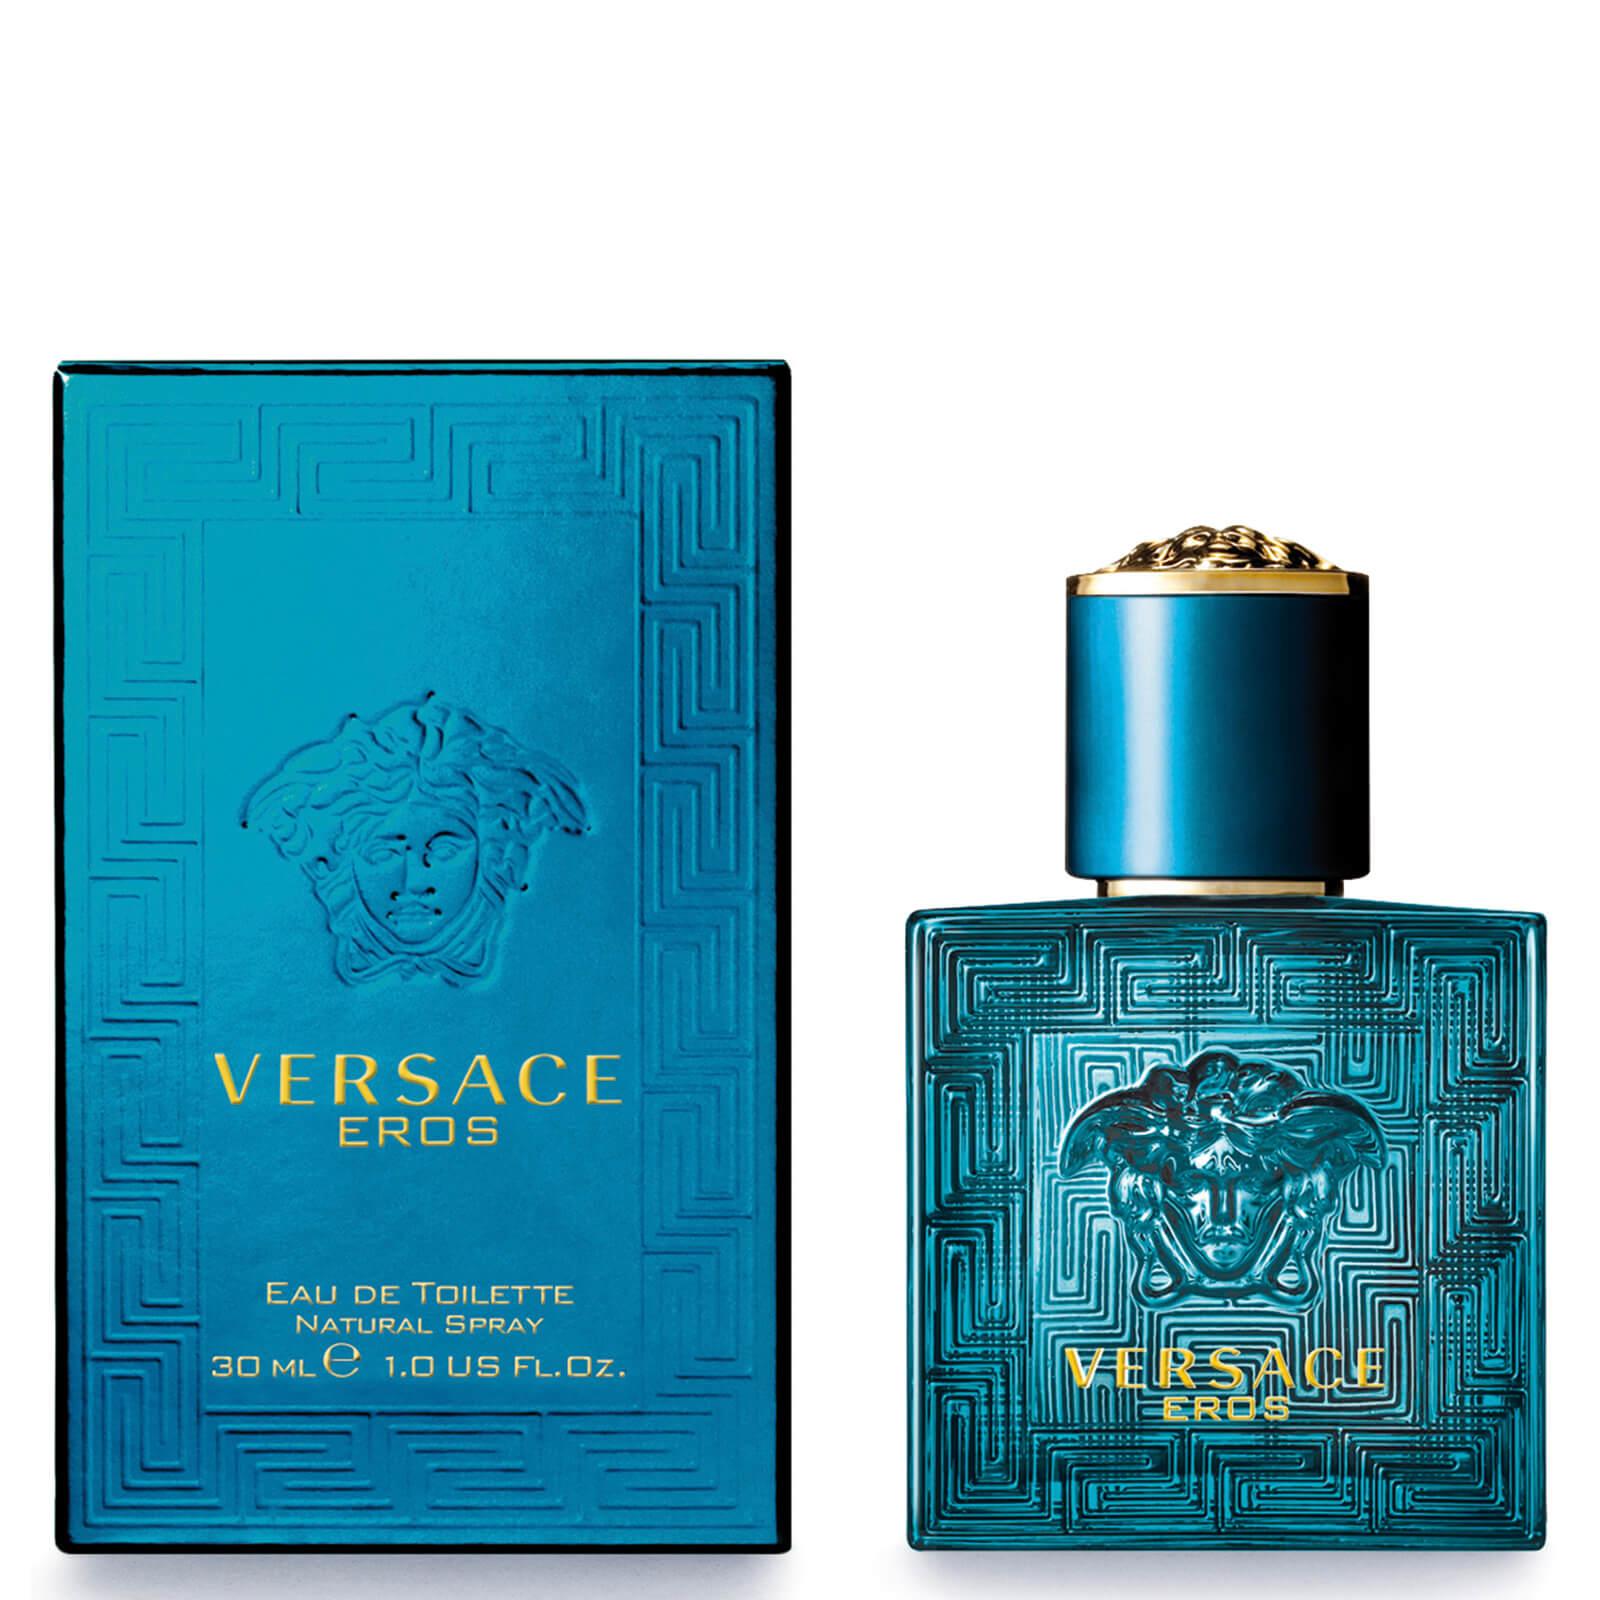 Versace Eros For Men Eau De Toilette 30ml Free Shipping